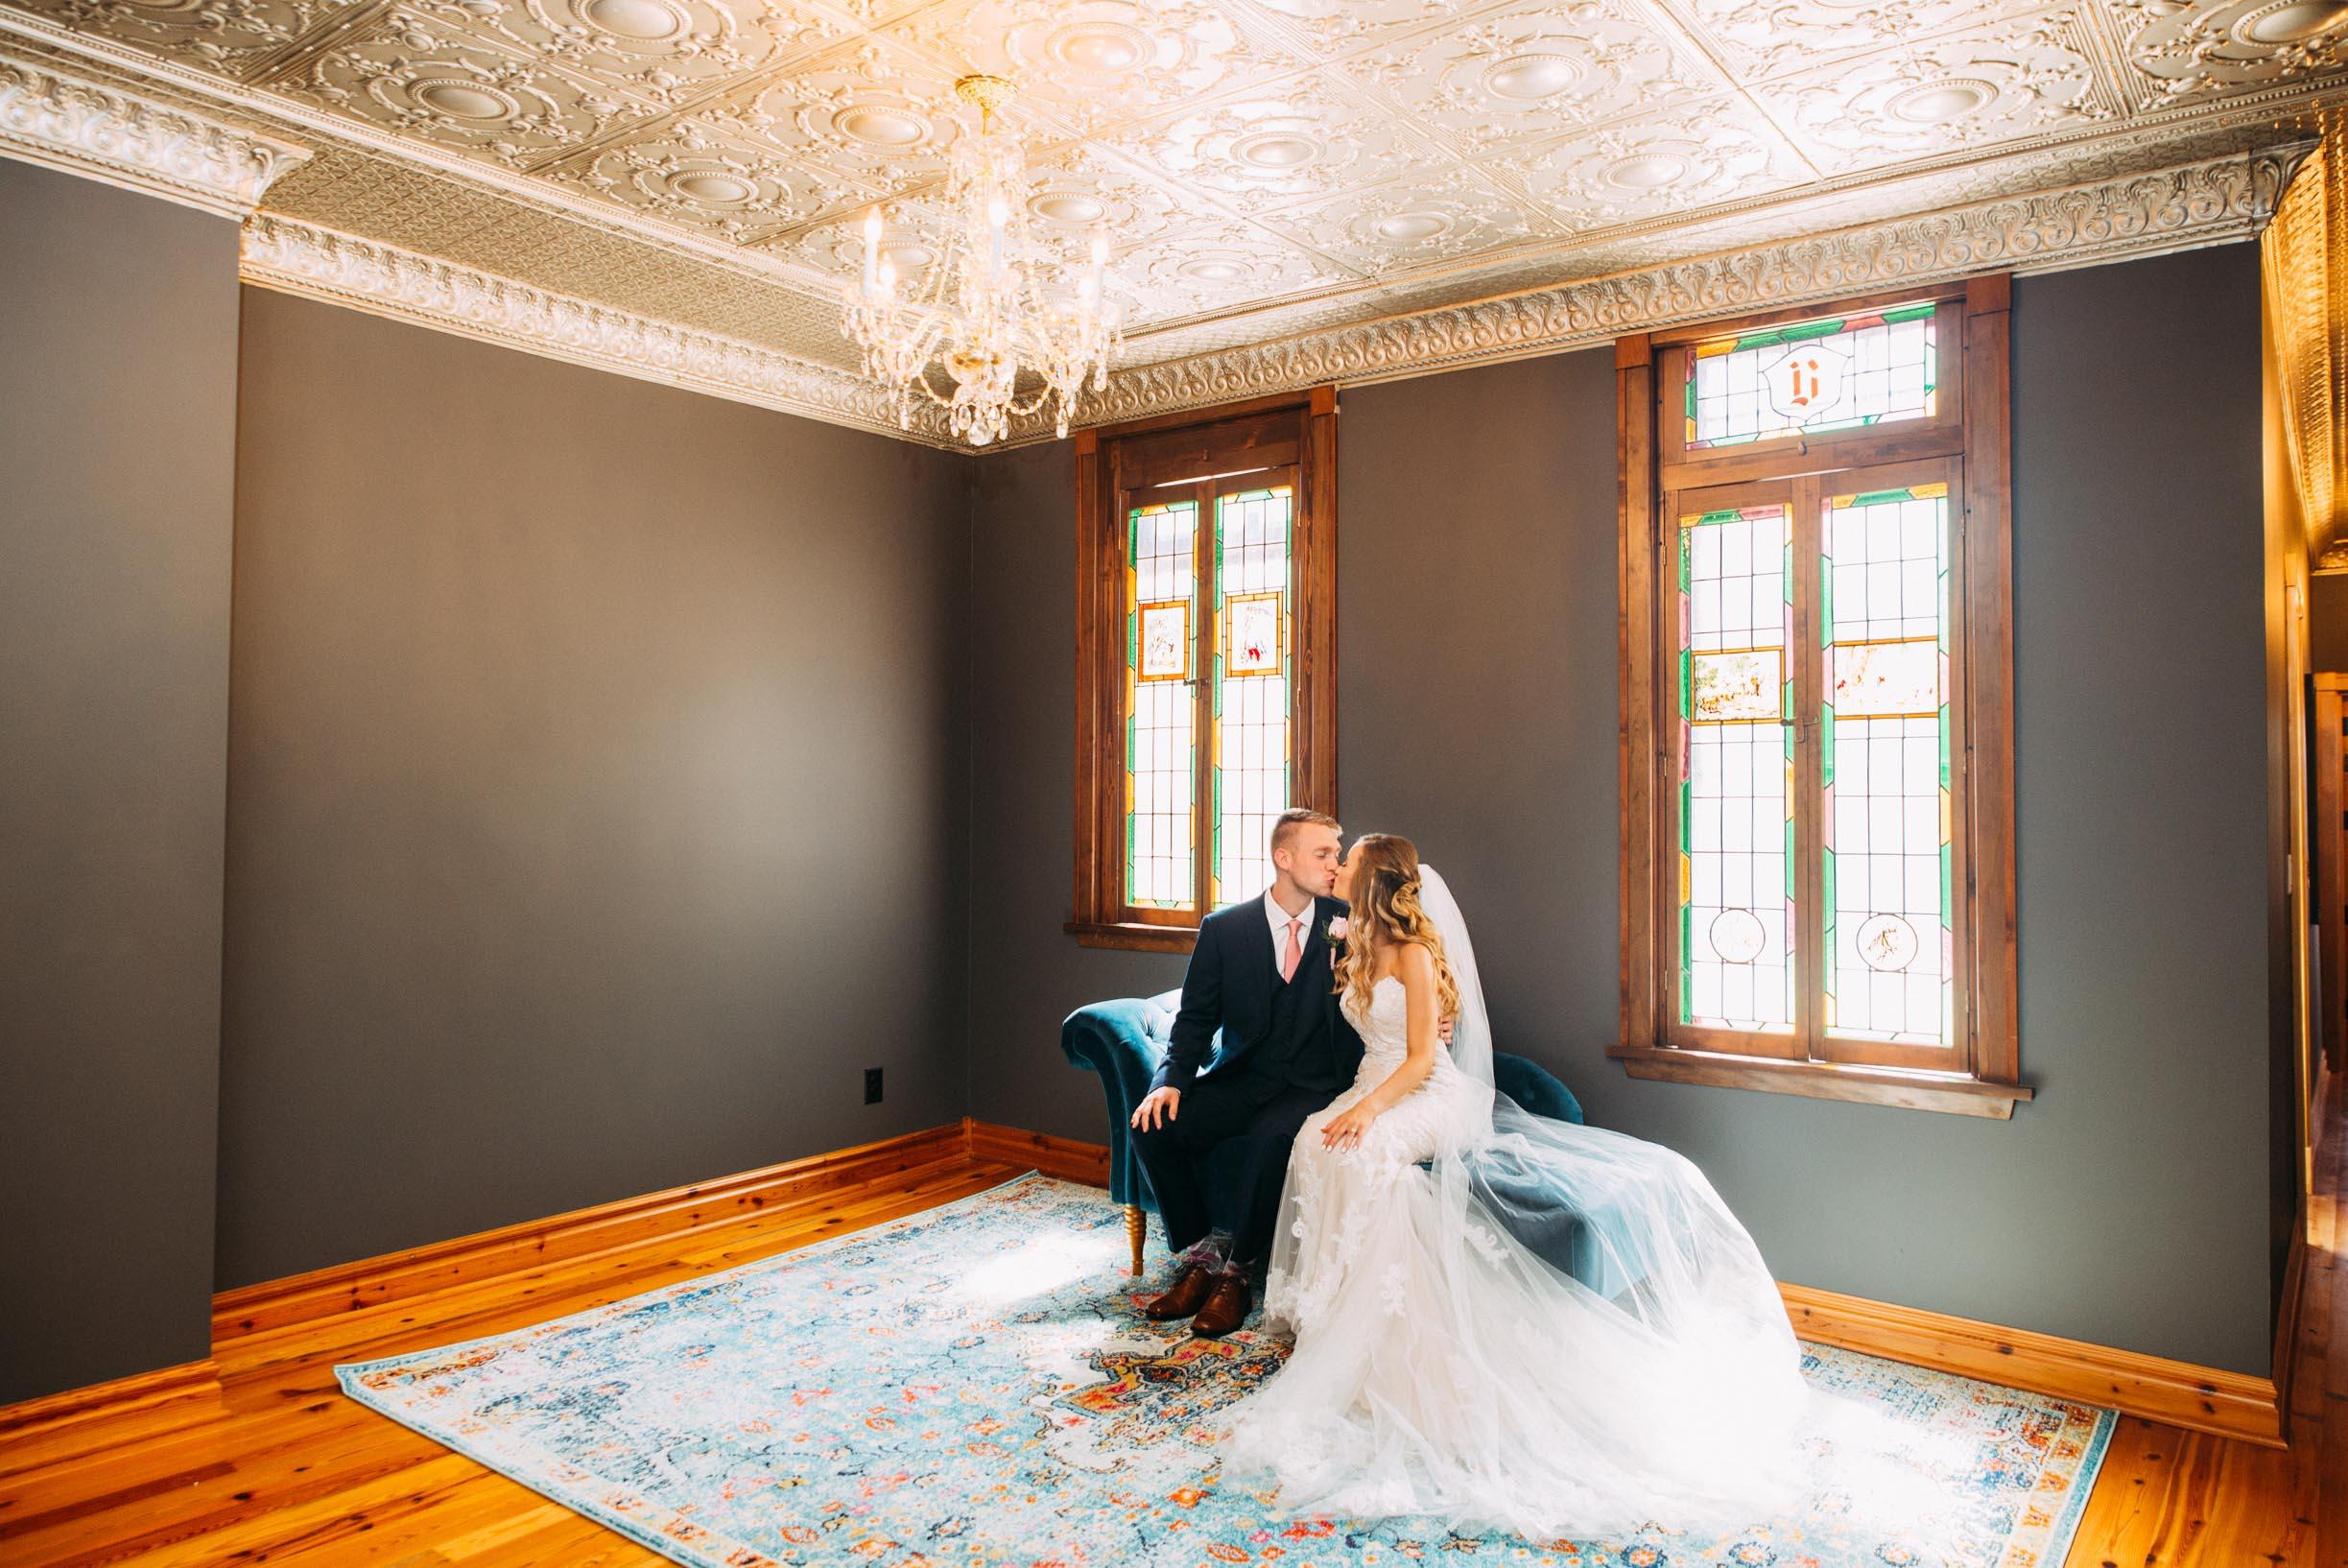 16-WeddingsattheBroz_Minnesota_WeddingBlog.jpg